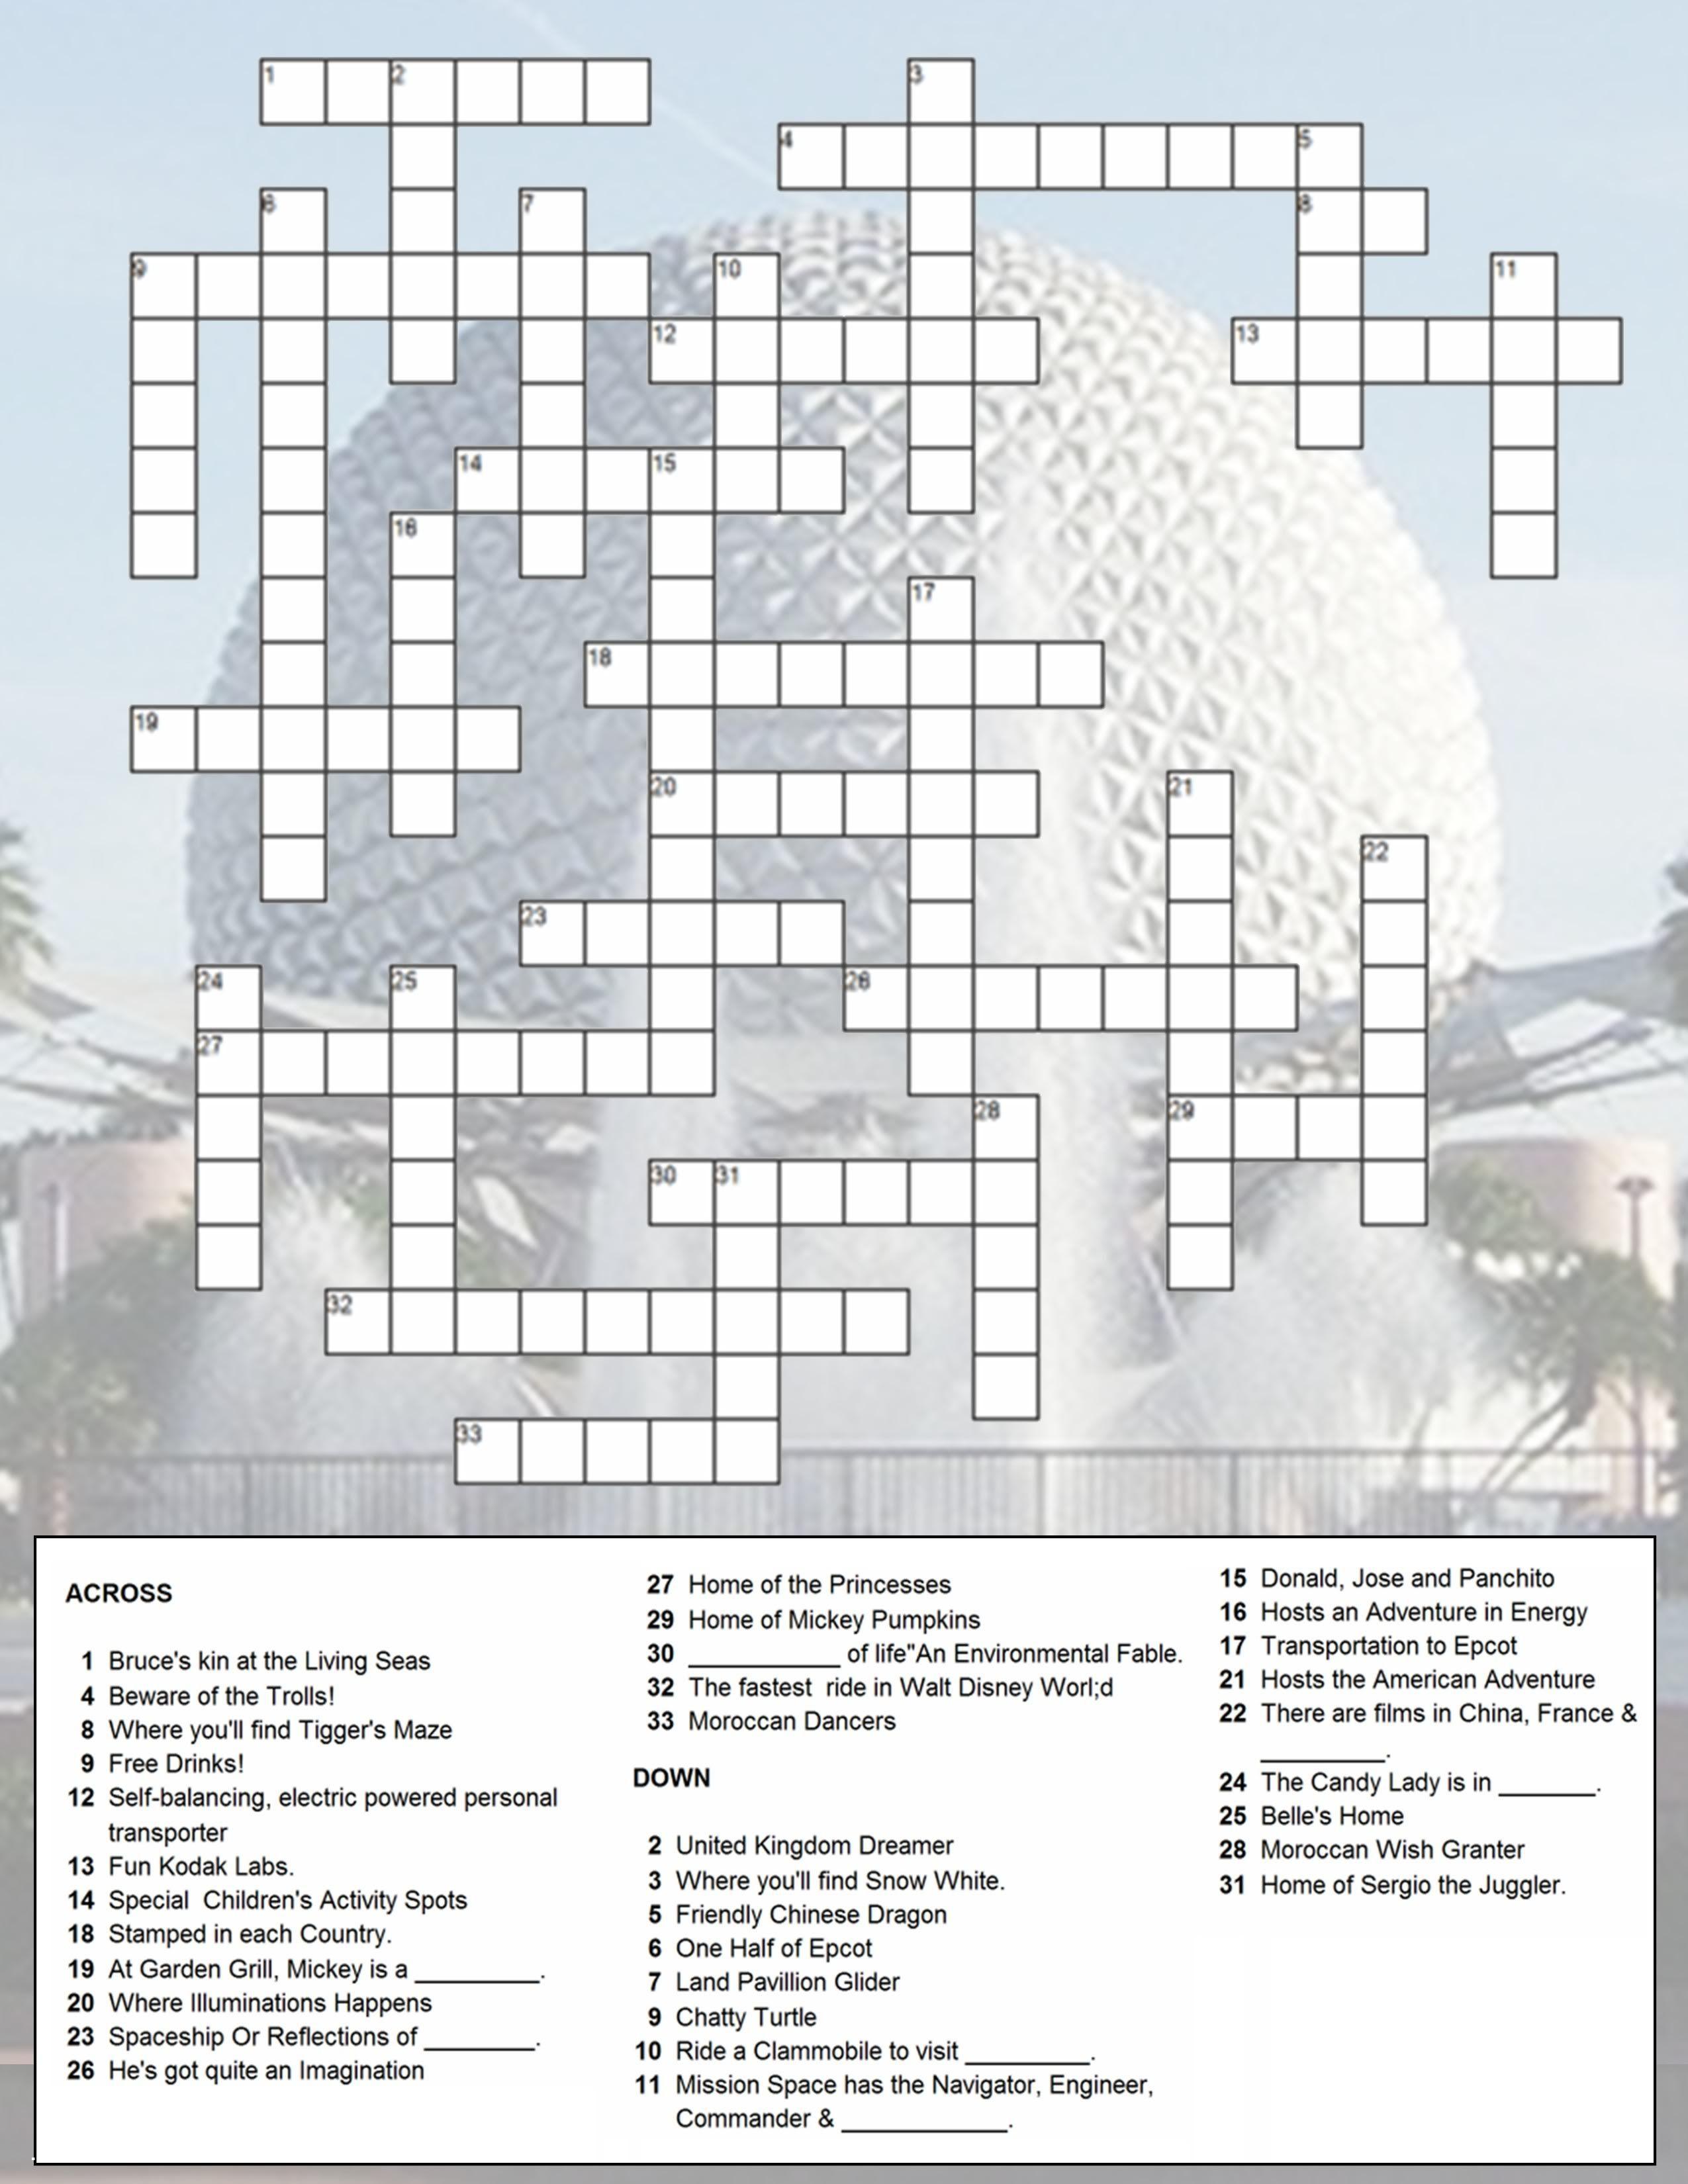 Printable Crossword Disney